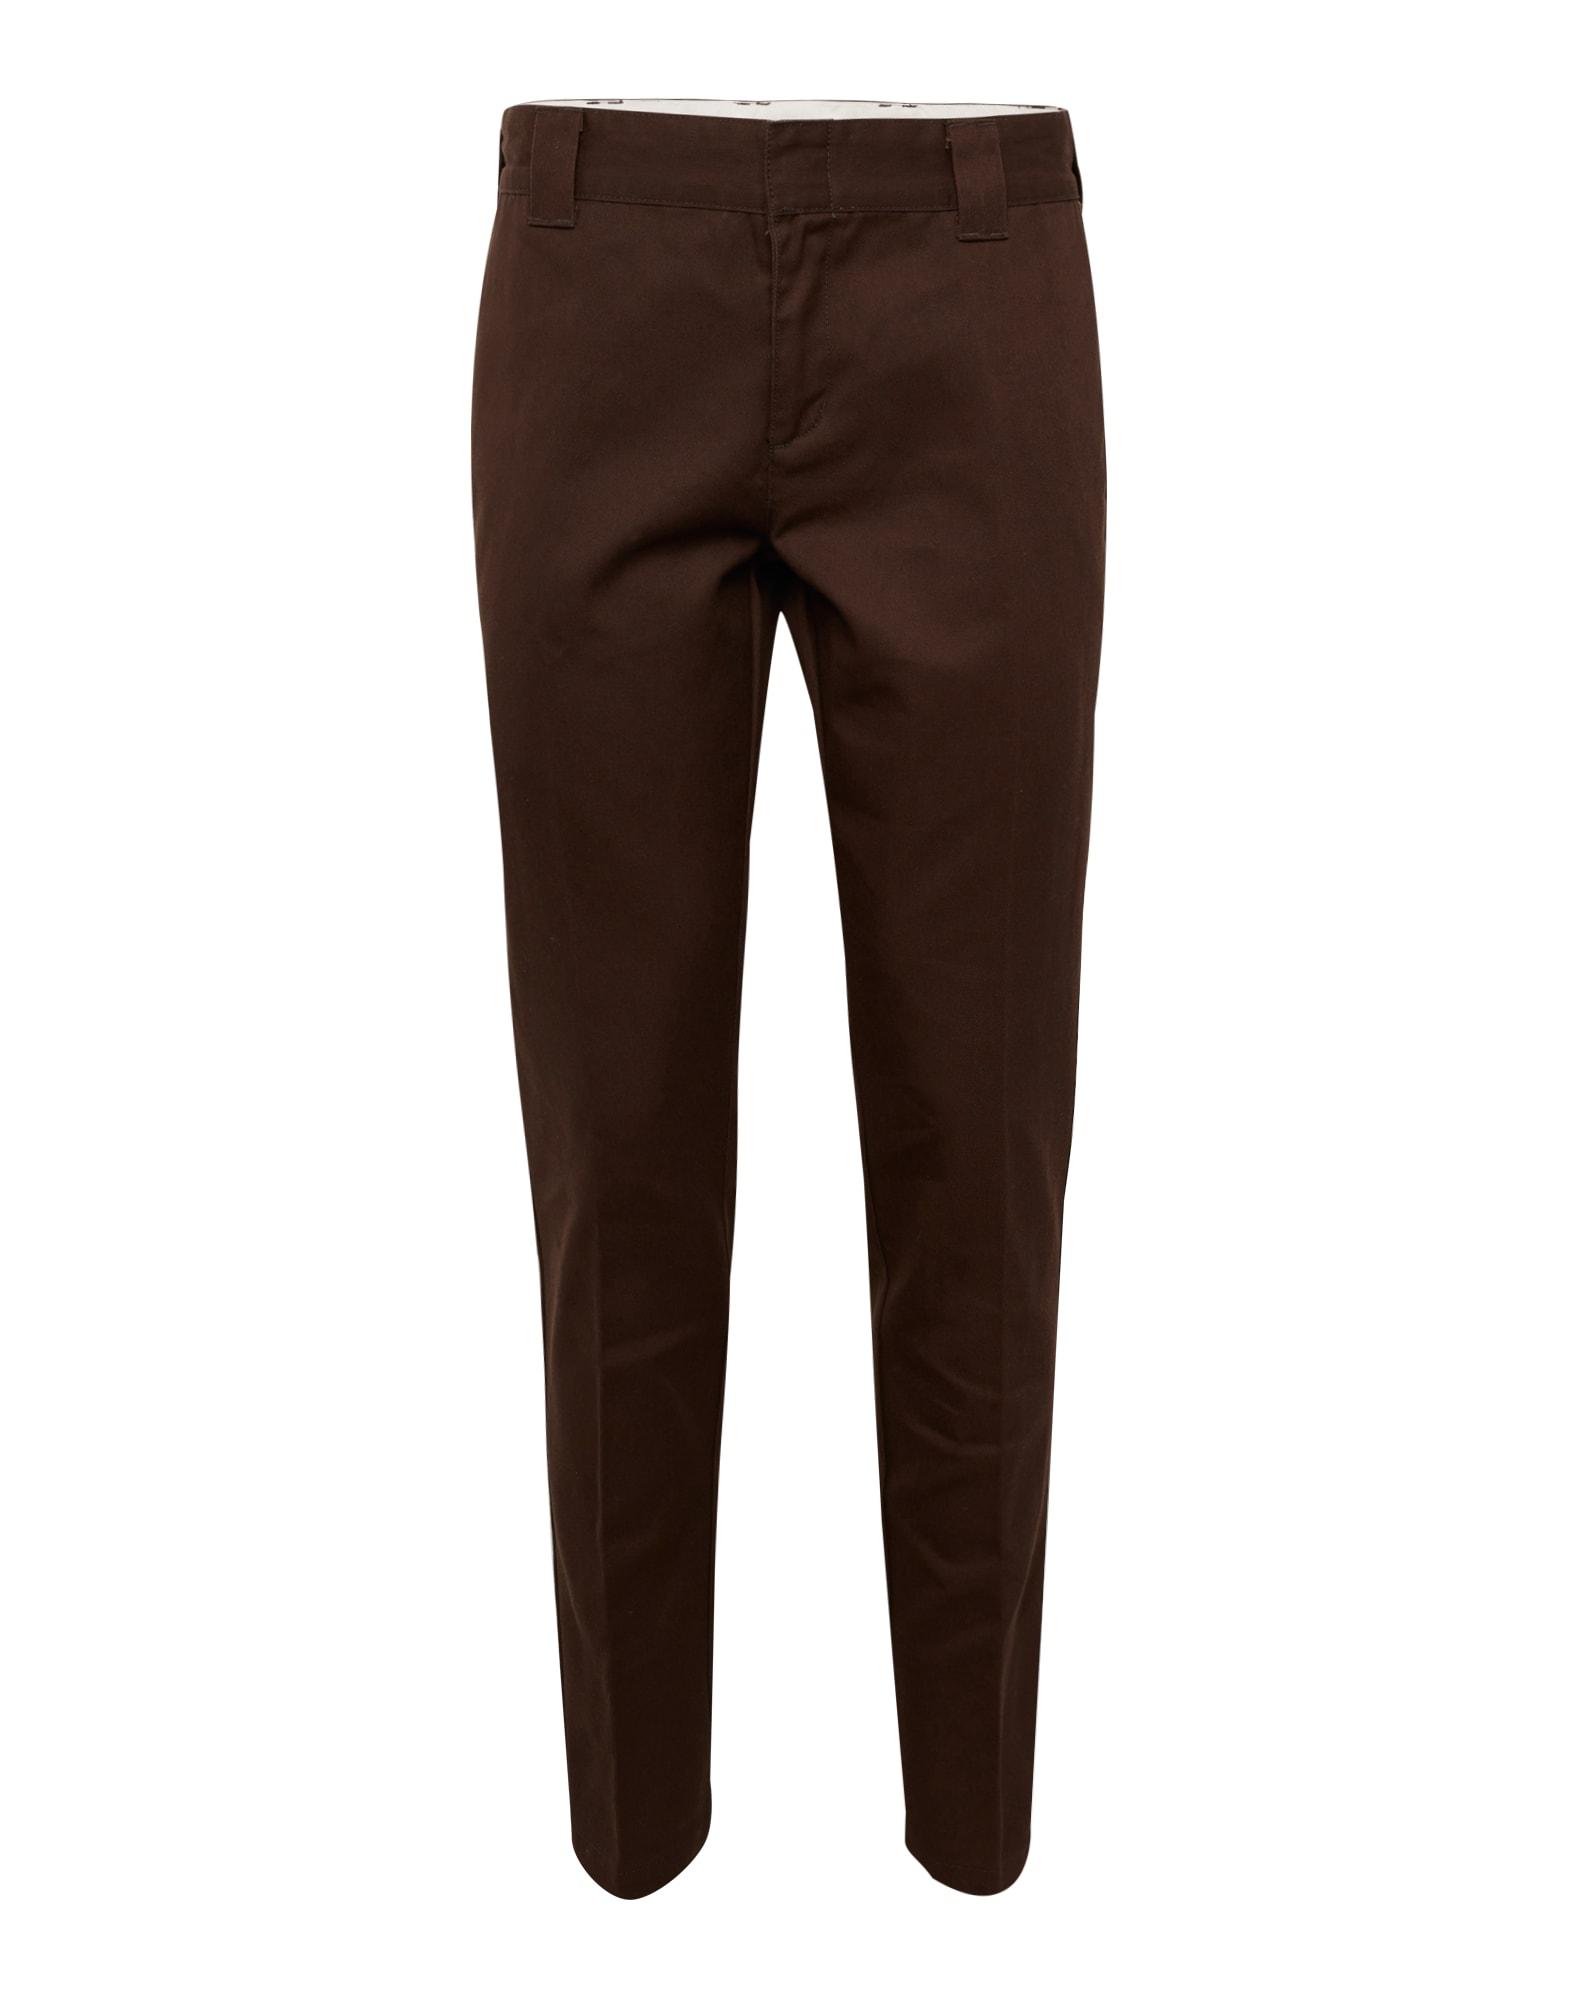 Chino kalhoty Workpant WE872 tmavě hnědá DICKIES